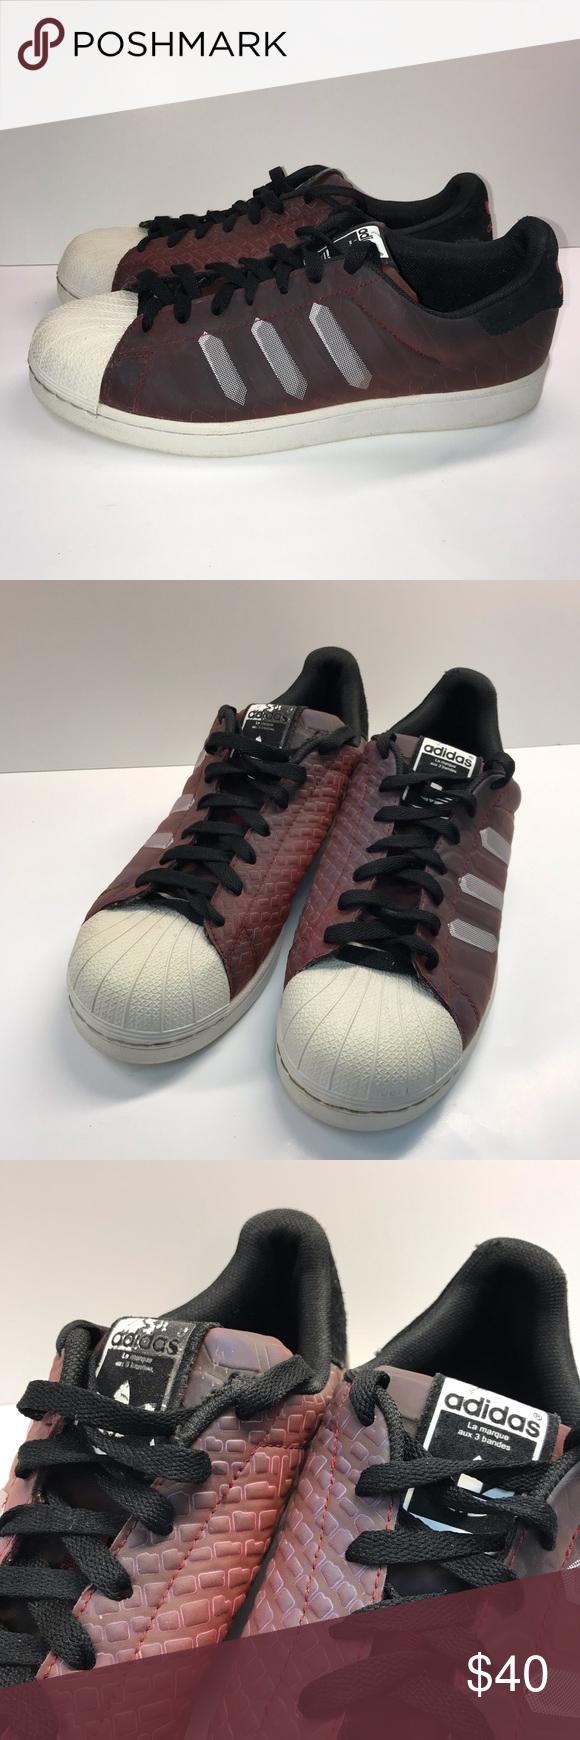 big sale 3c923 4e6d0 Adidas Superstar Chromatech Sneakers Burgundy 9 adidas Superstar CTXM  Chromatech Sneakers BurgundyWhite 9 (